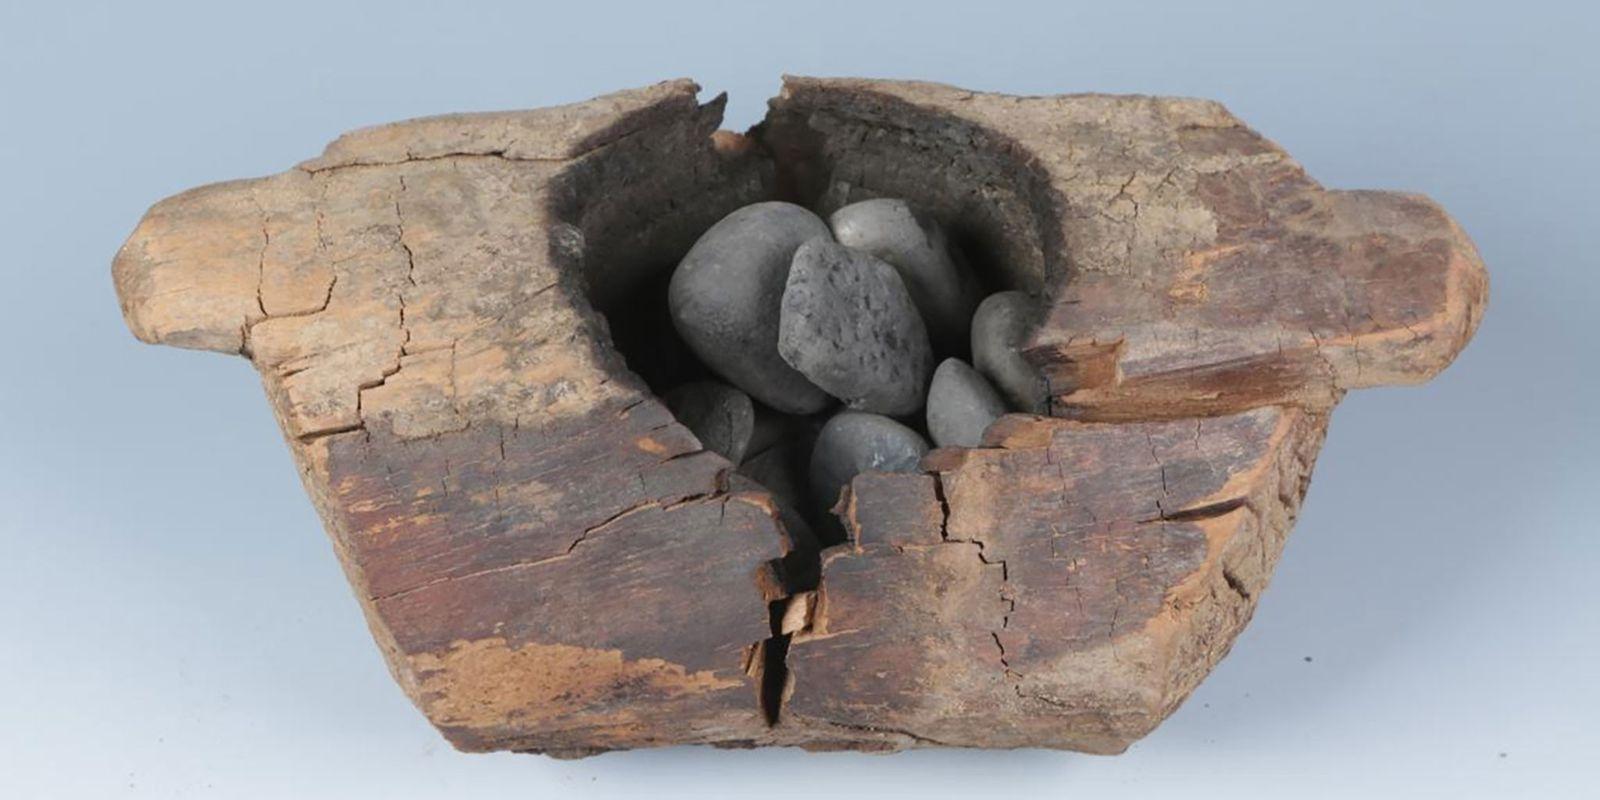 Ältester Beleg für Haschkonsum auf Friedhof entdeckt